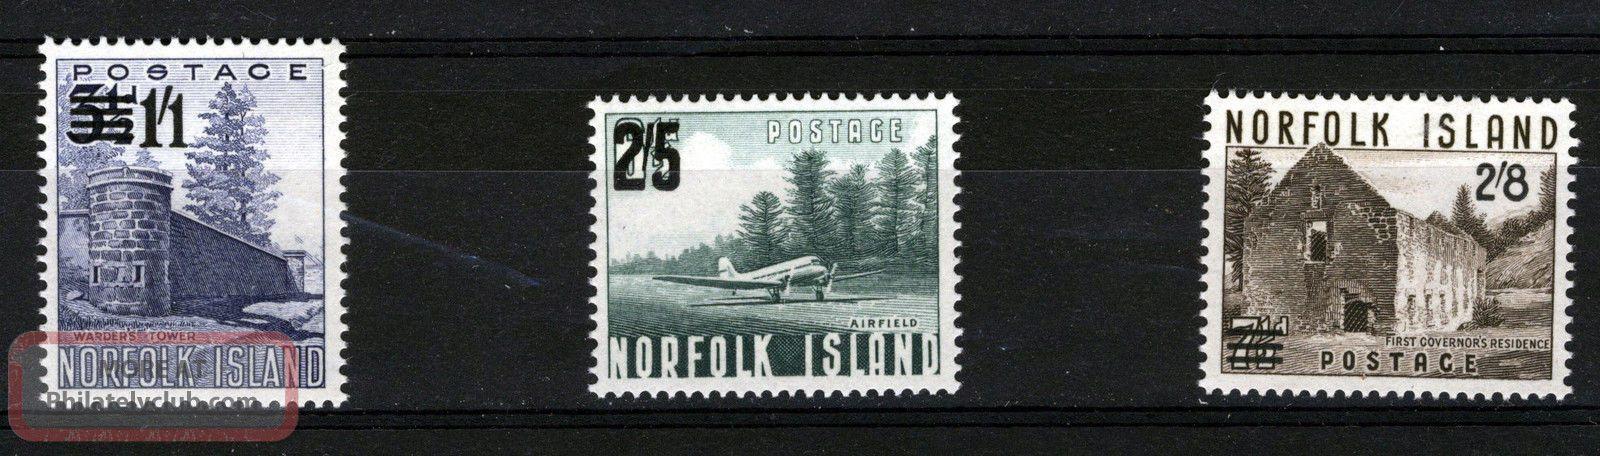 Norfolk Island 1960 Definitives Sg37/39 British Colonies & Territories photo